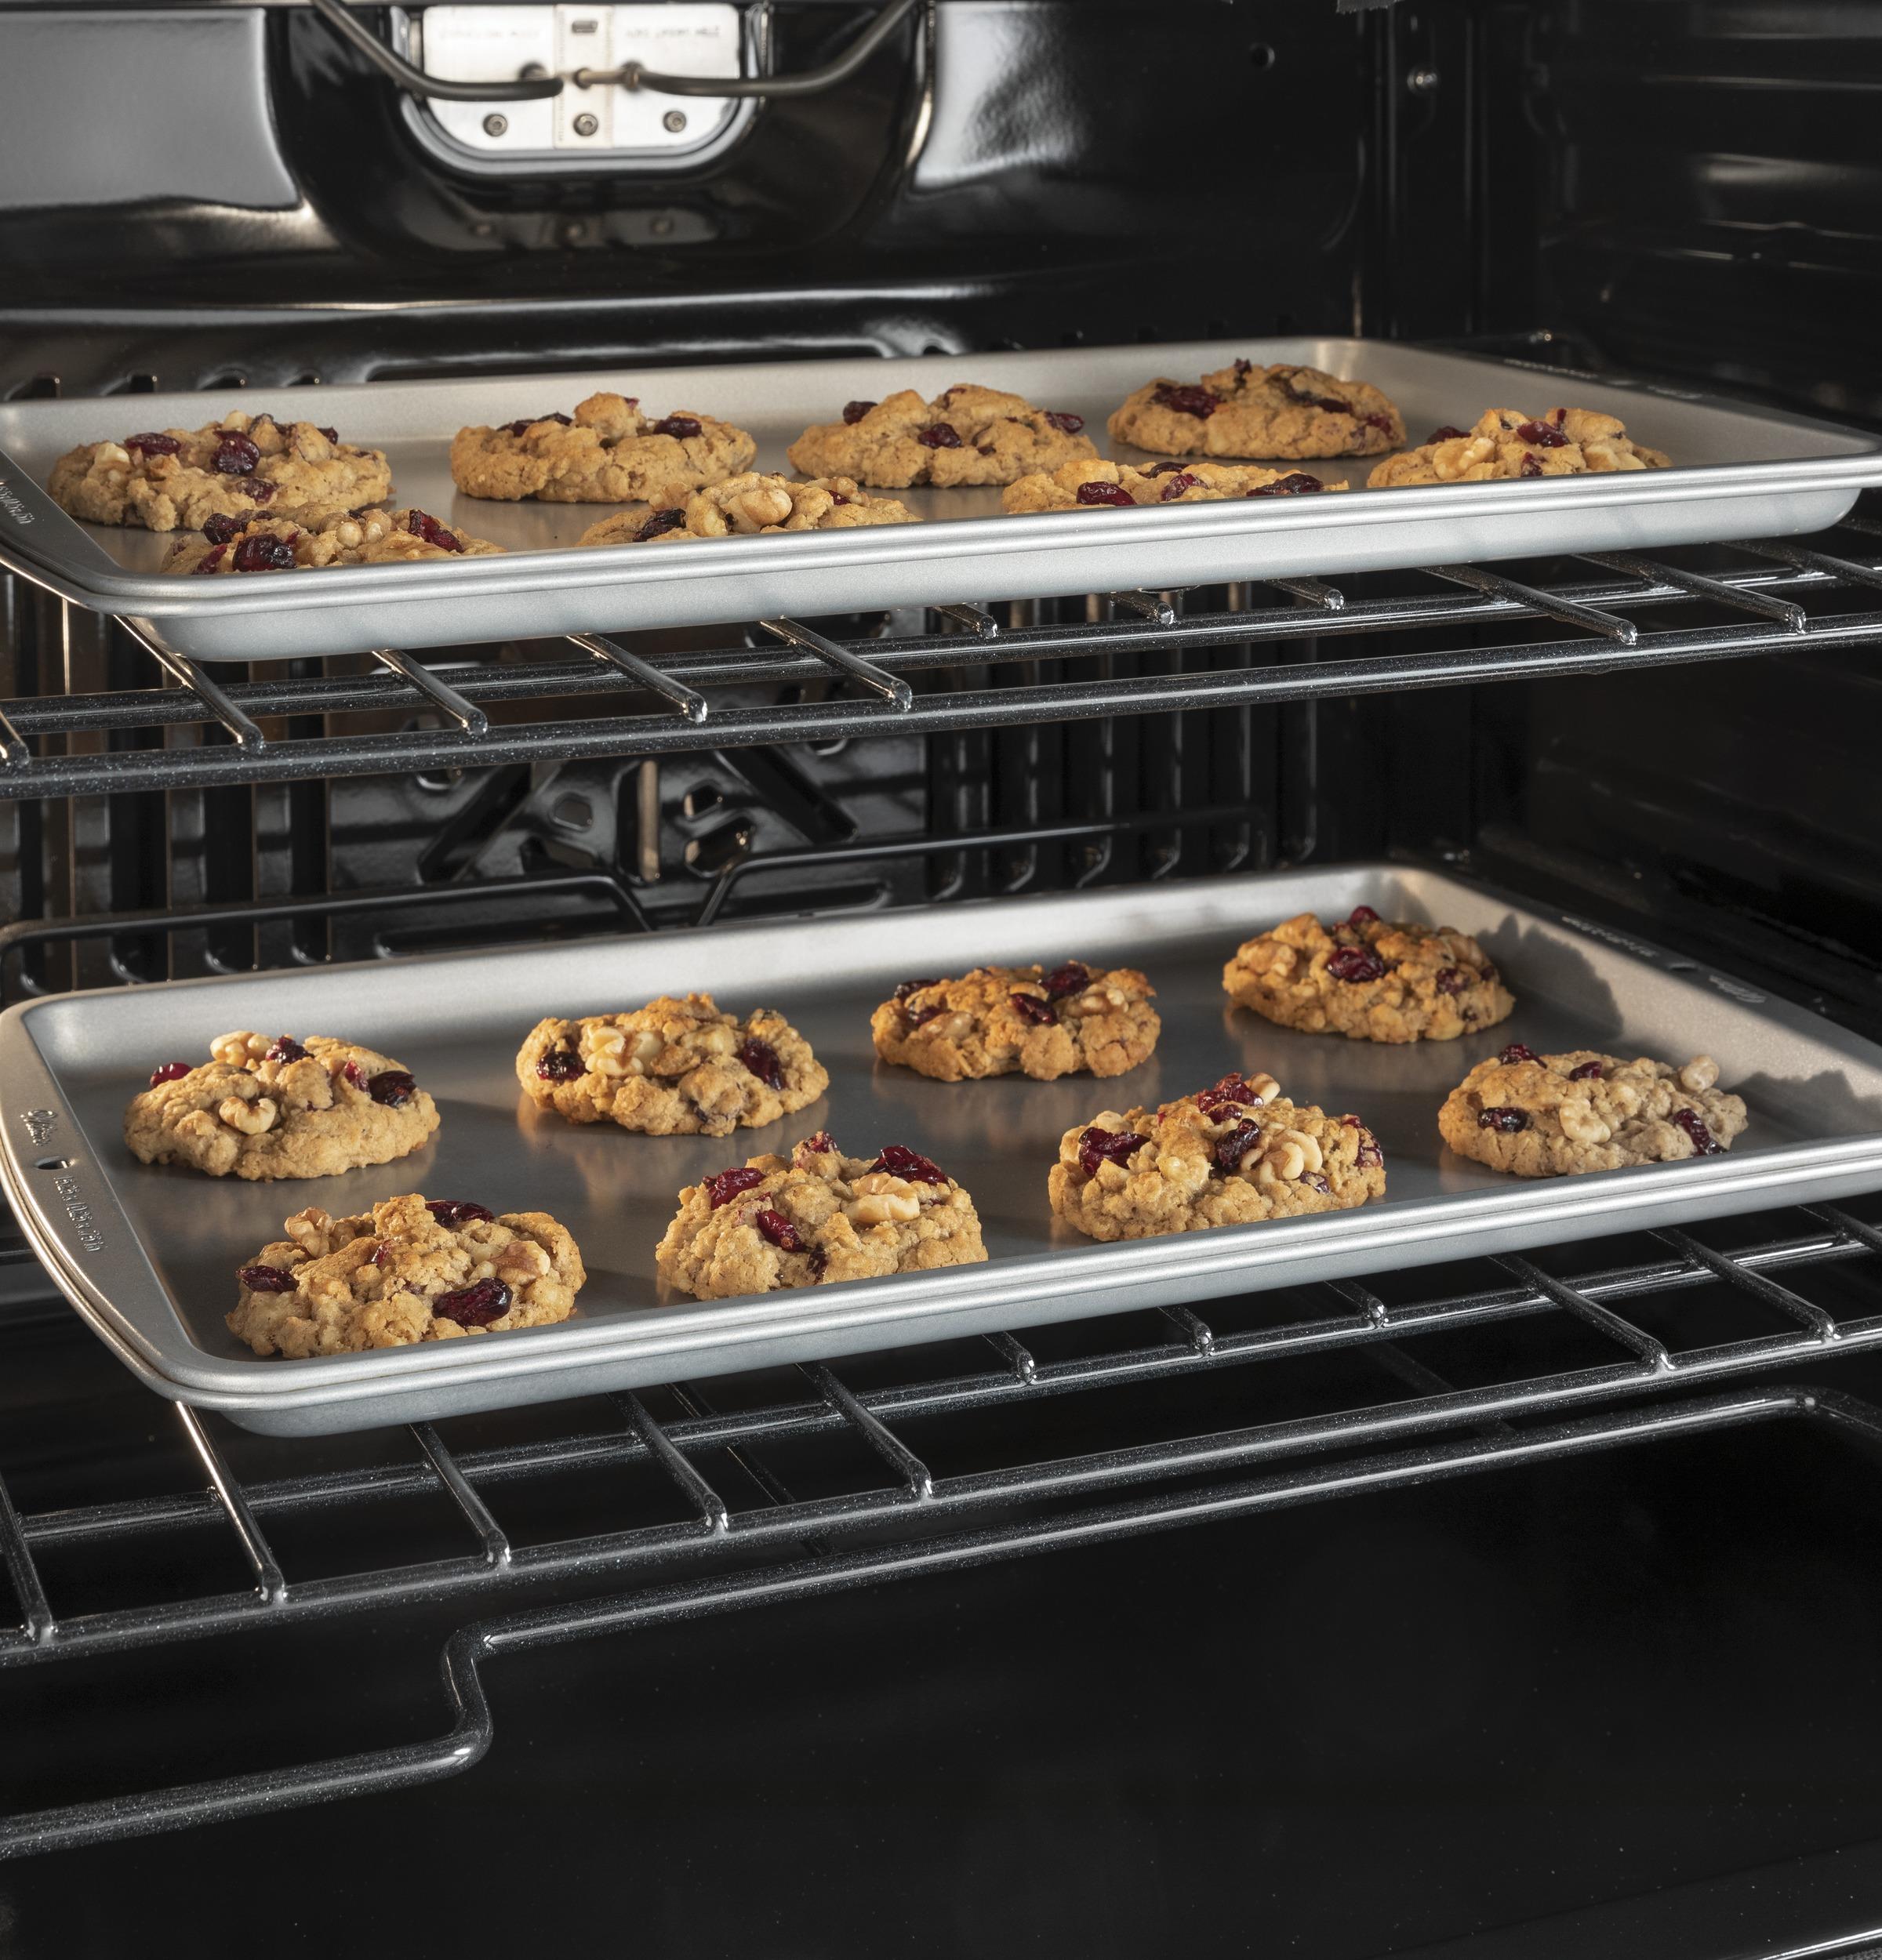 "Model: JKD5000ENES | GE GE® 27"" Smart Built-In Convection Double Wall Oven"